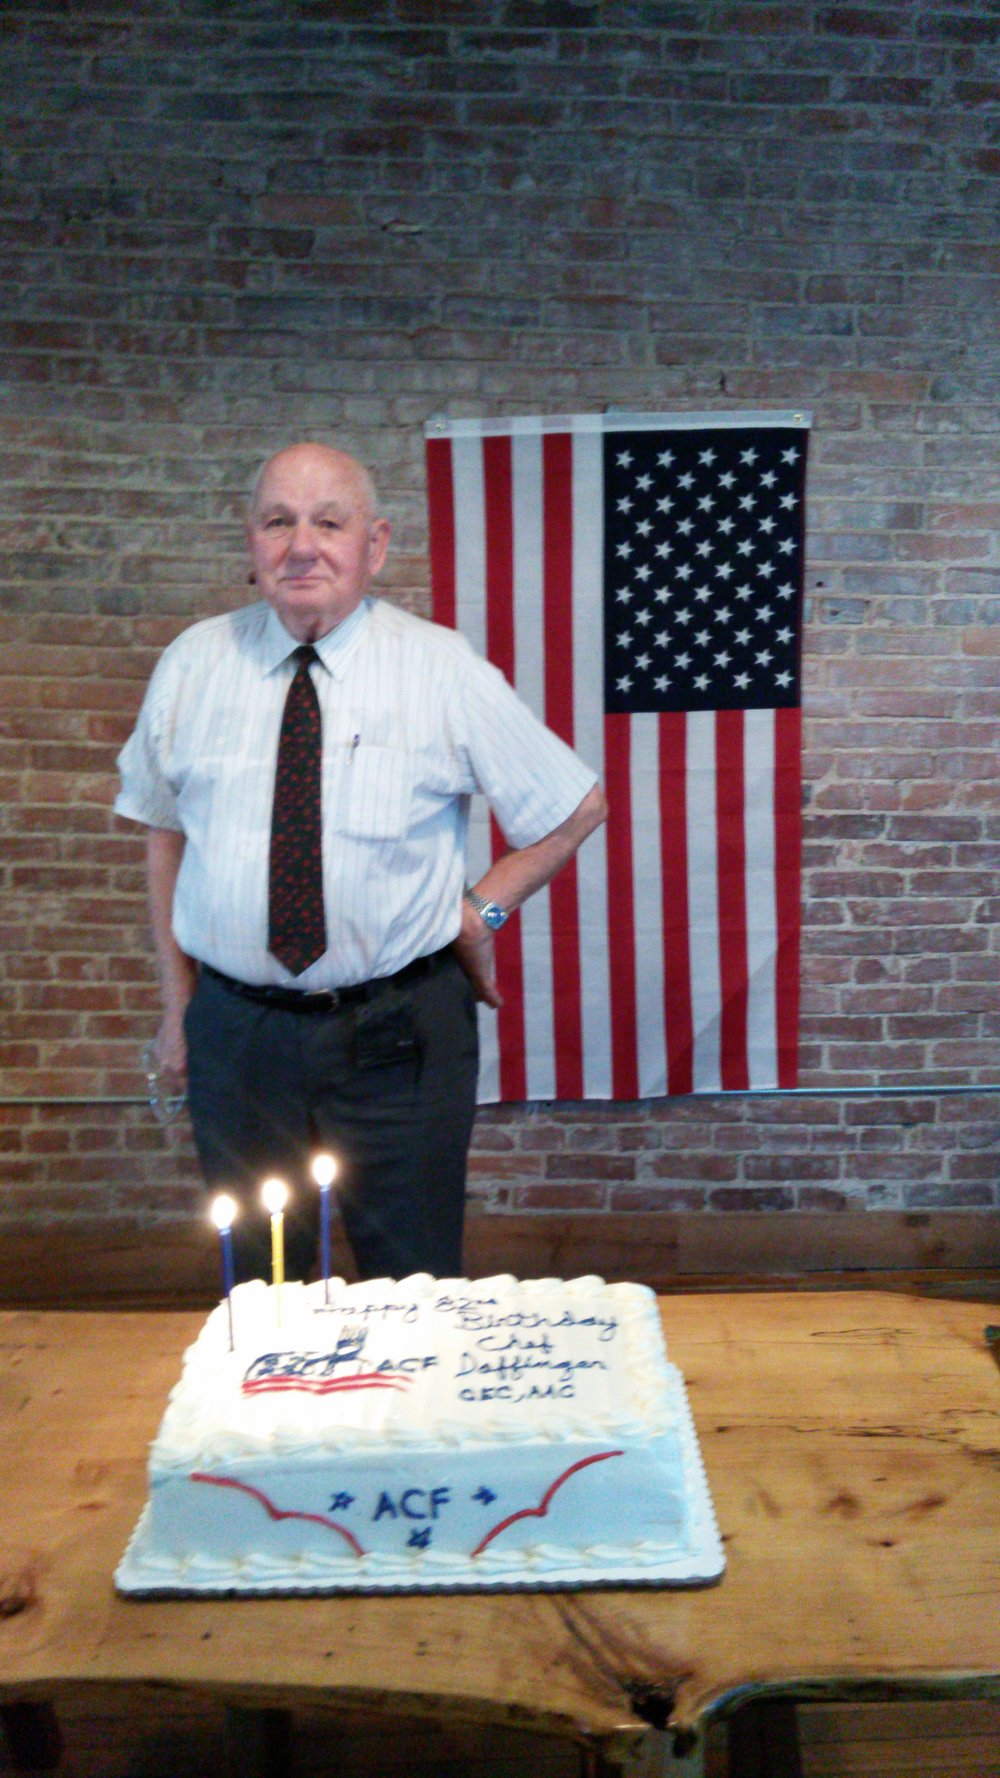 Willi Daffinger celebrating his 82nd birthday!